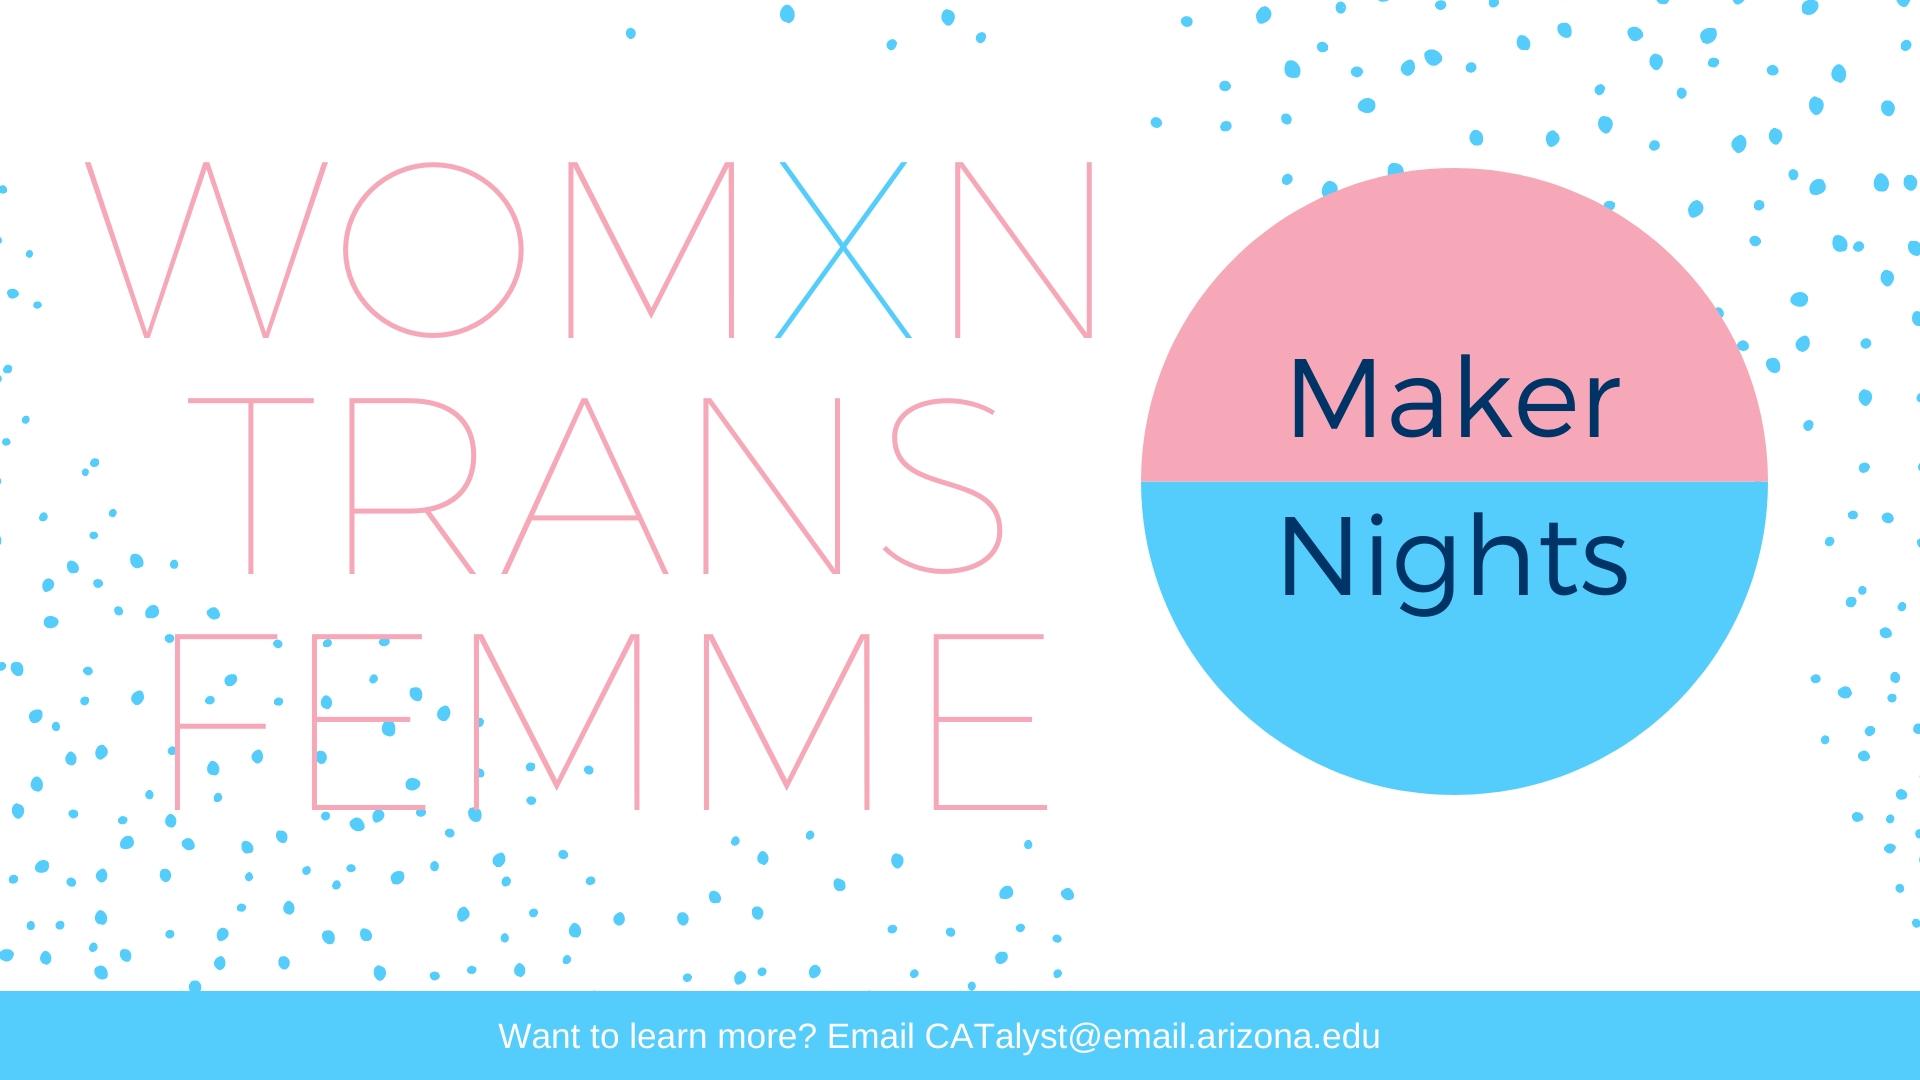 Womxn/Trans/Femme Maker Night